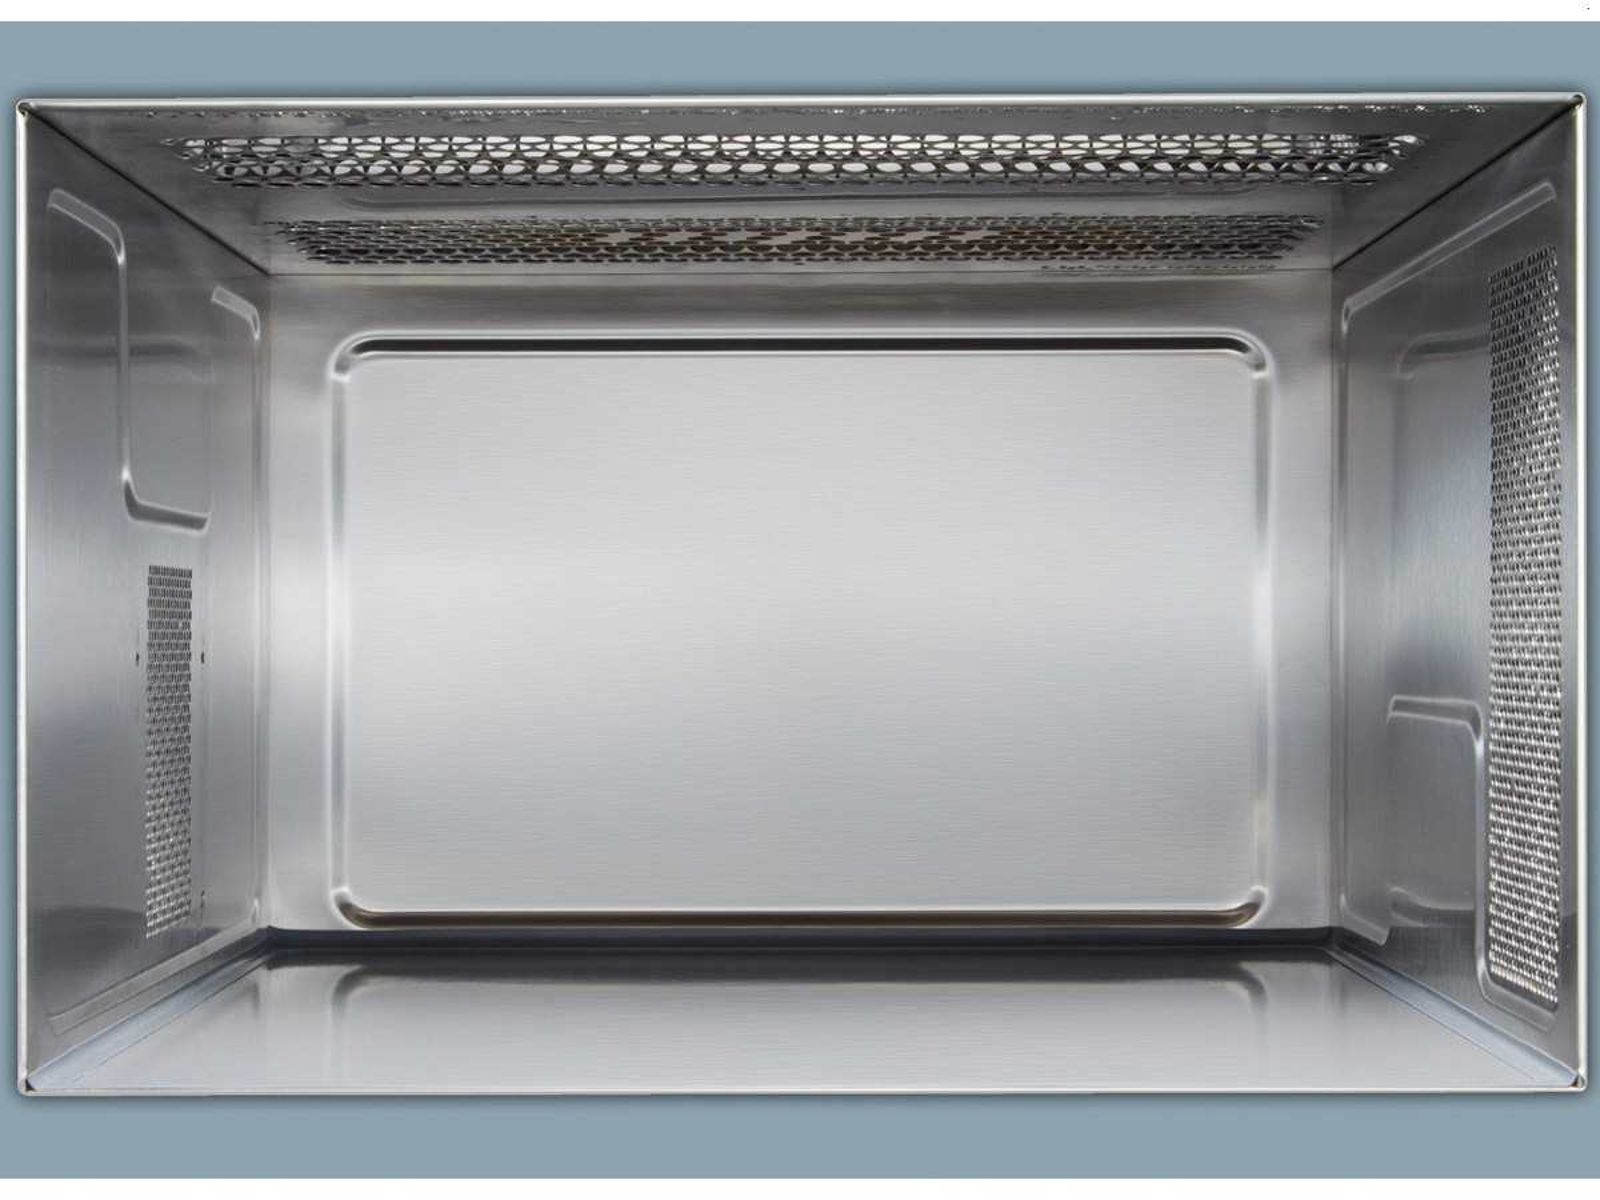 bosch bfr634gw1 einbau mikrowelle polar wei. Black Bedroom Furniture Sets. Home Design Ideas